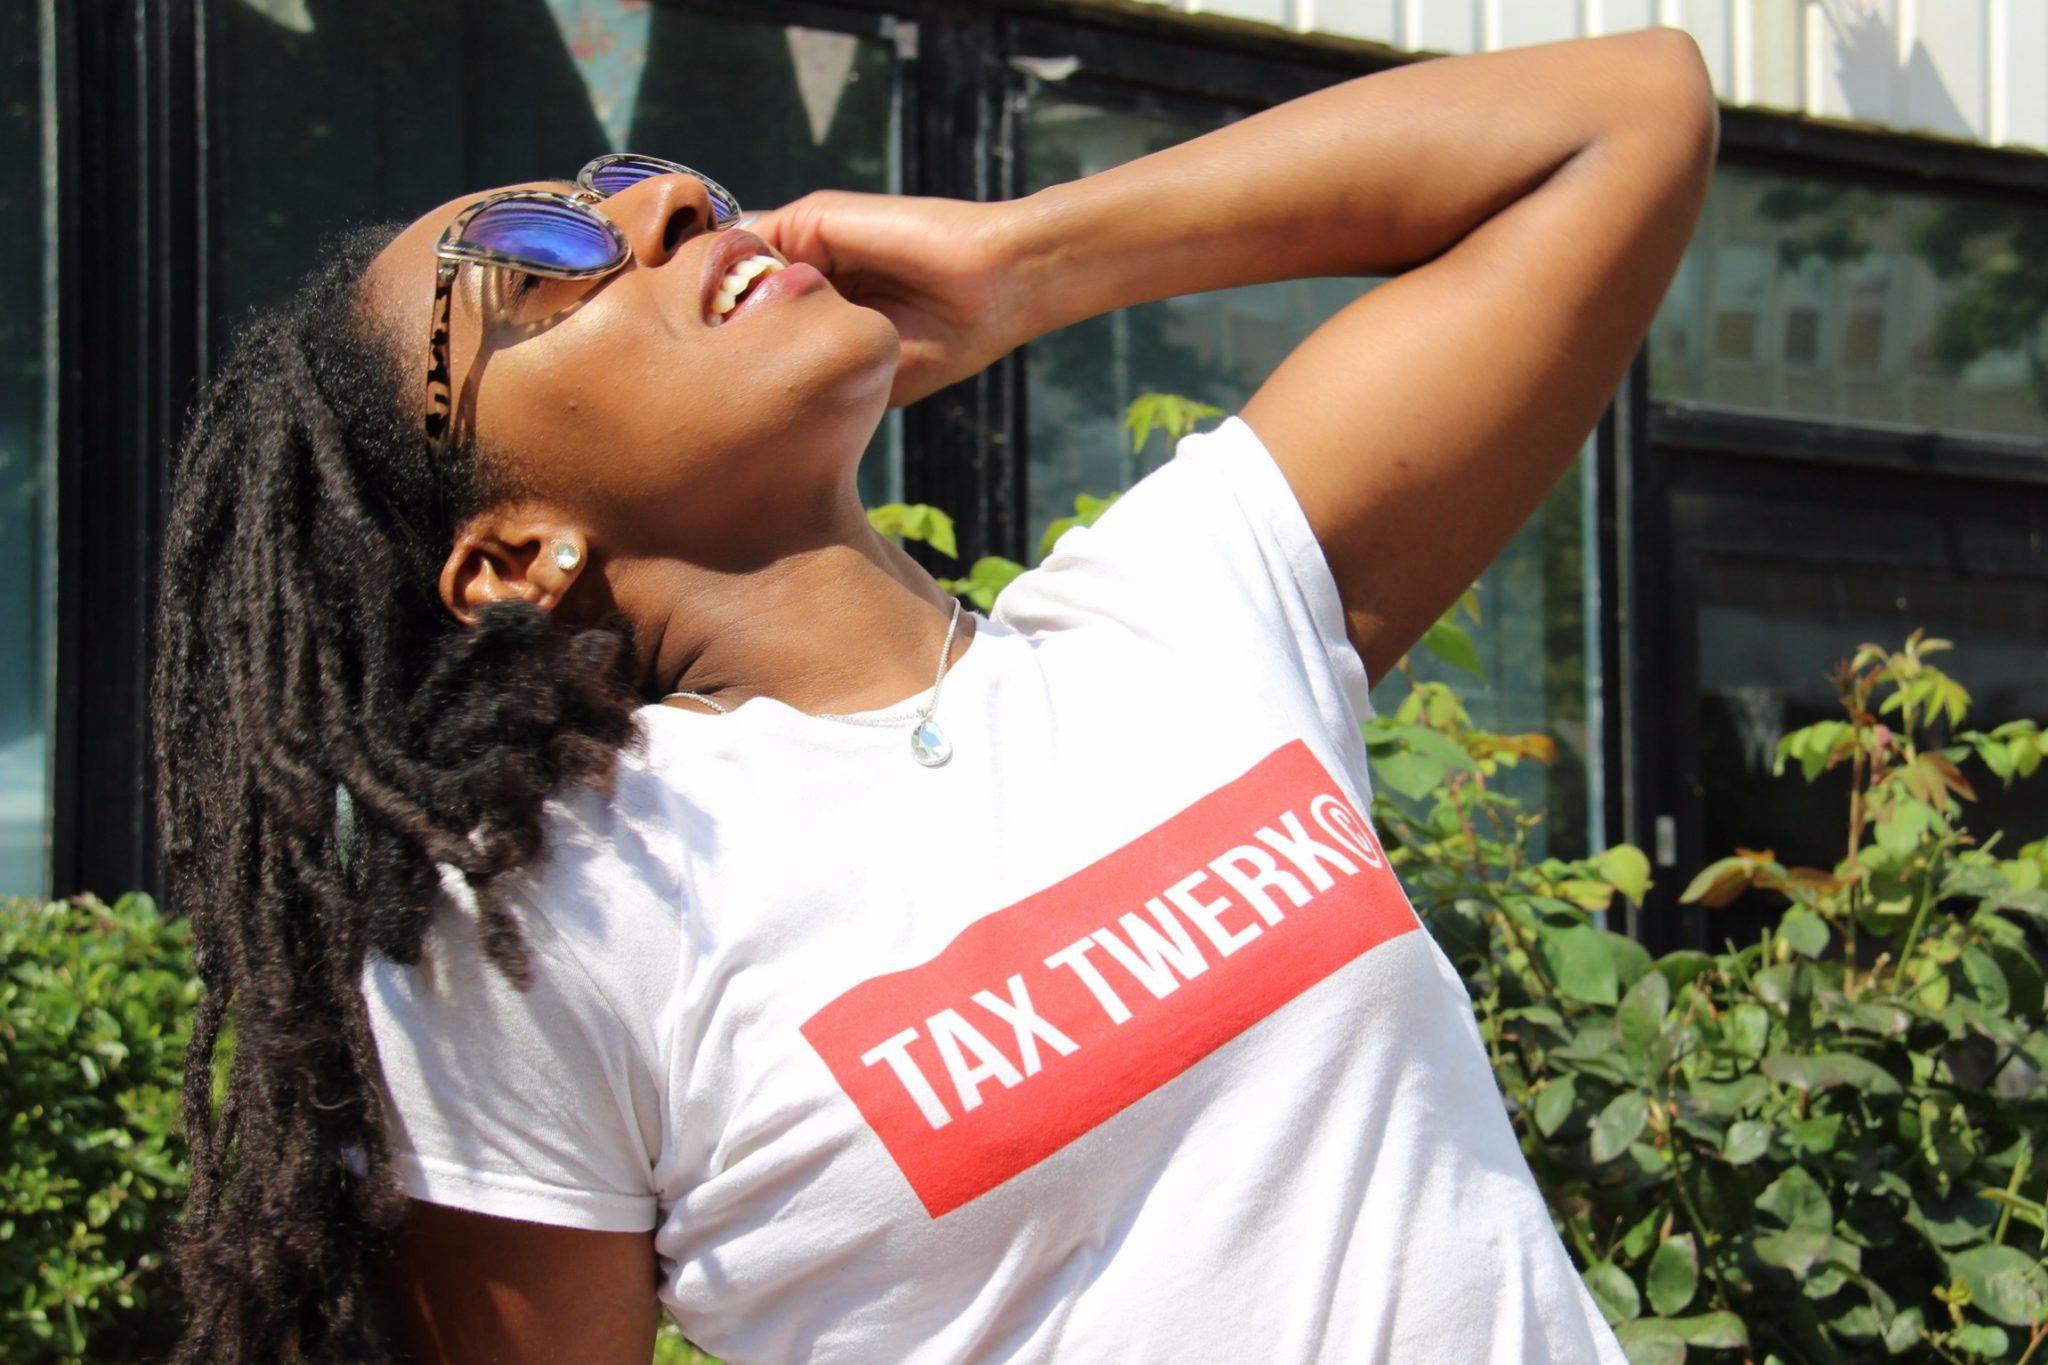 scalable small business ideas tax twerk